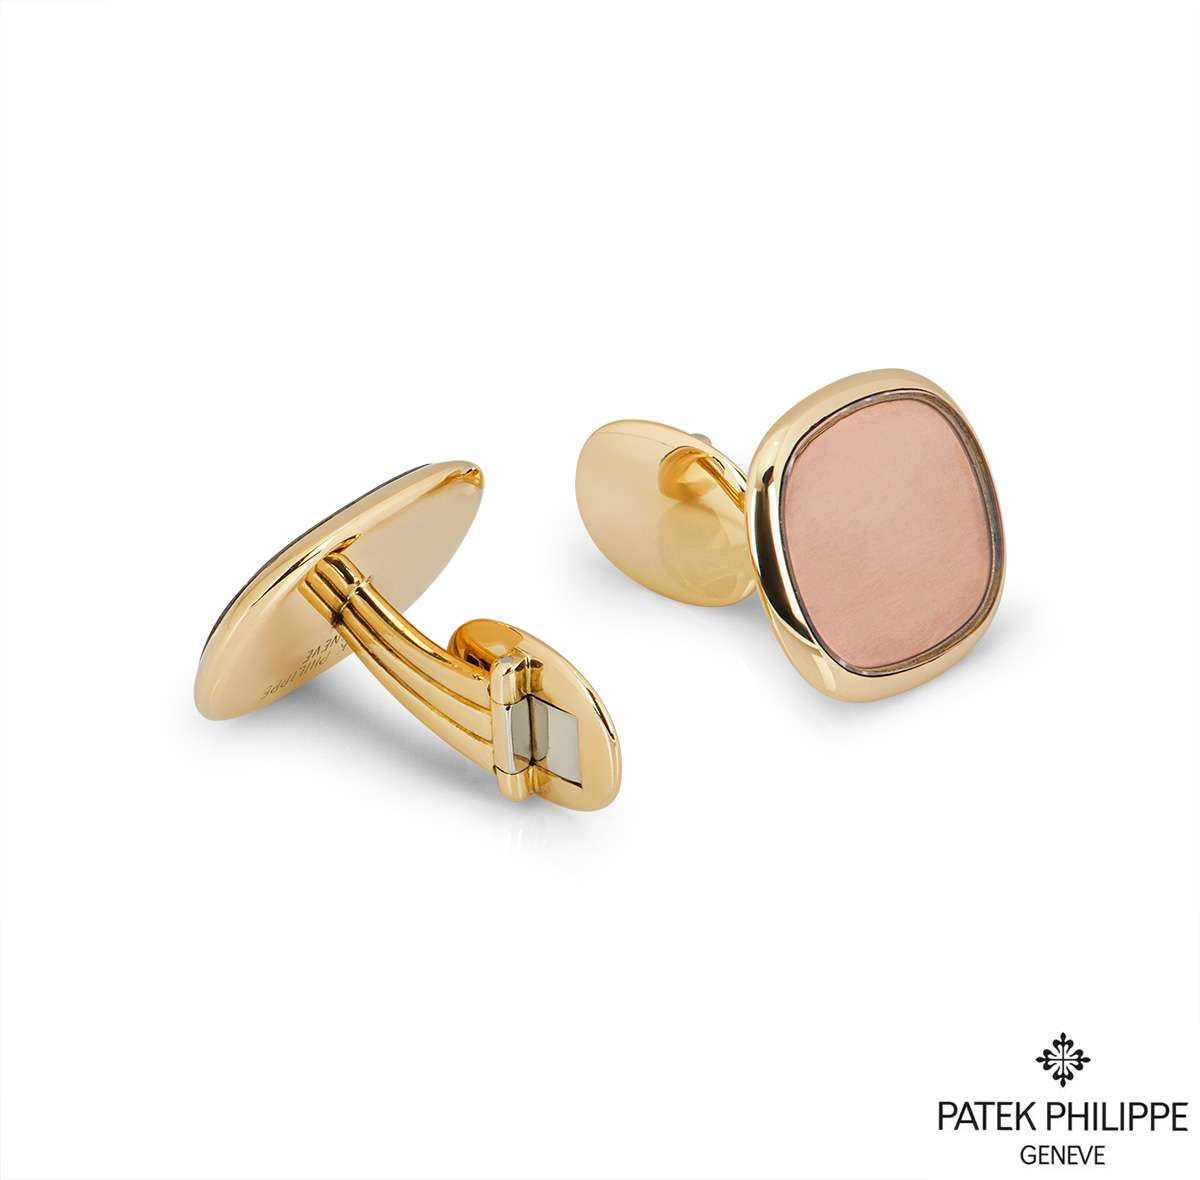 Patek Philippe Yellow Gold Ellipse Cufflinks